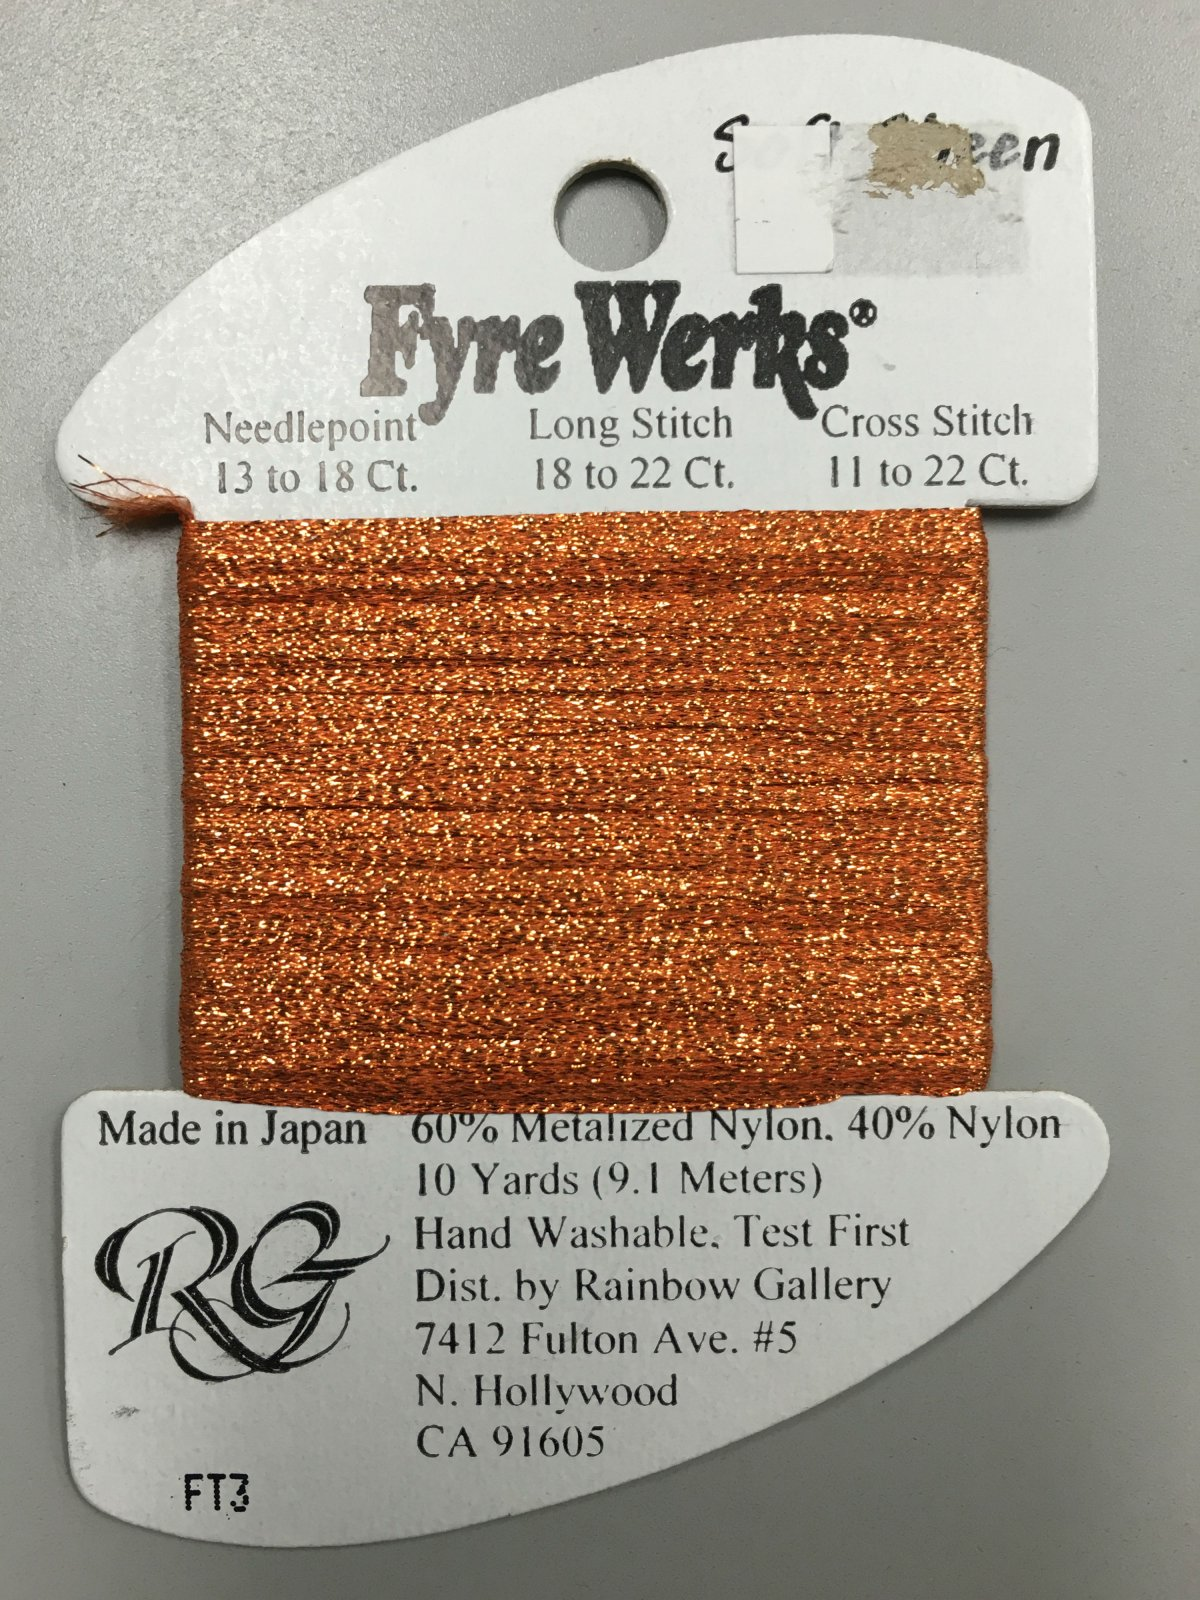 Fyre Werks Soft Sheen FT3